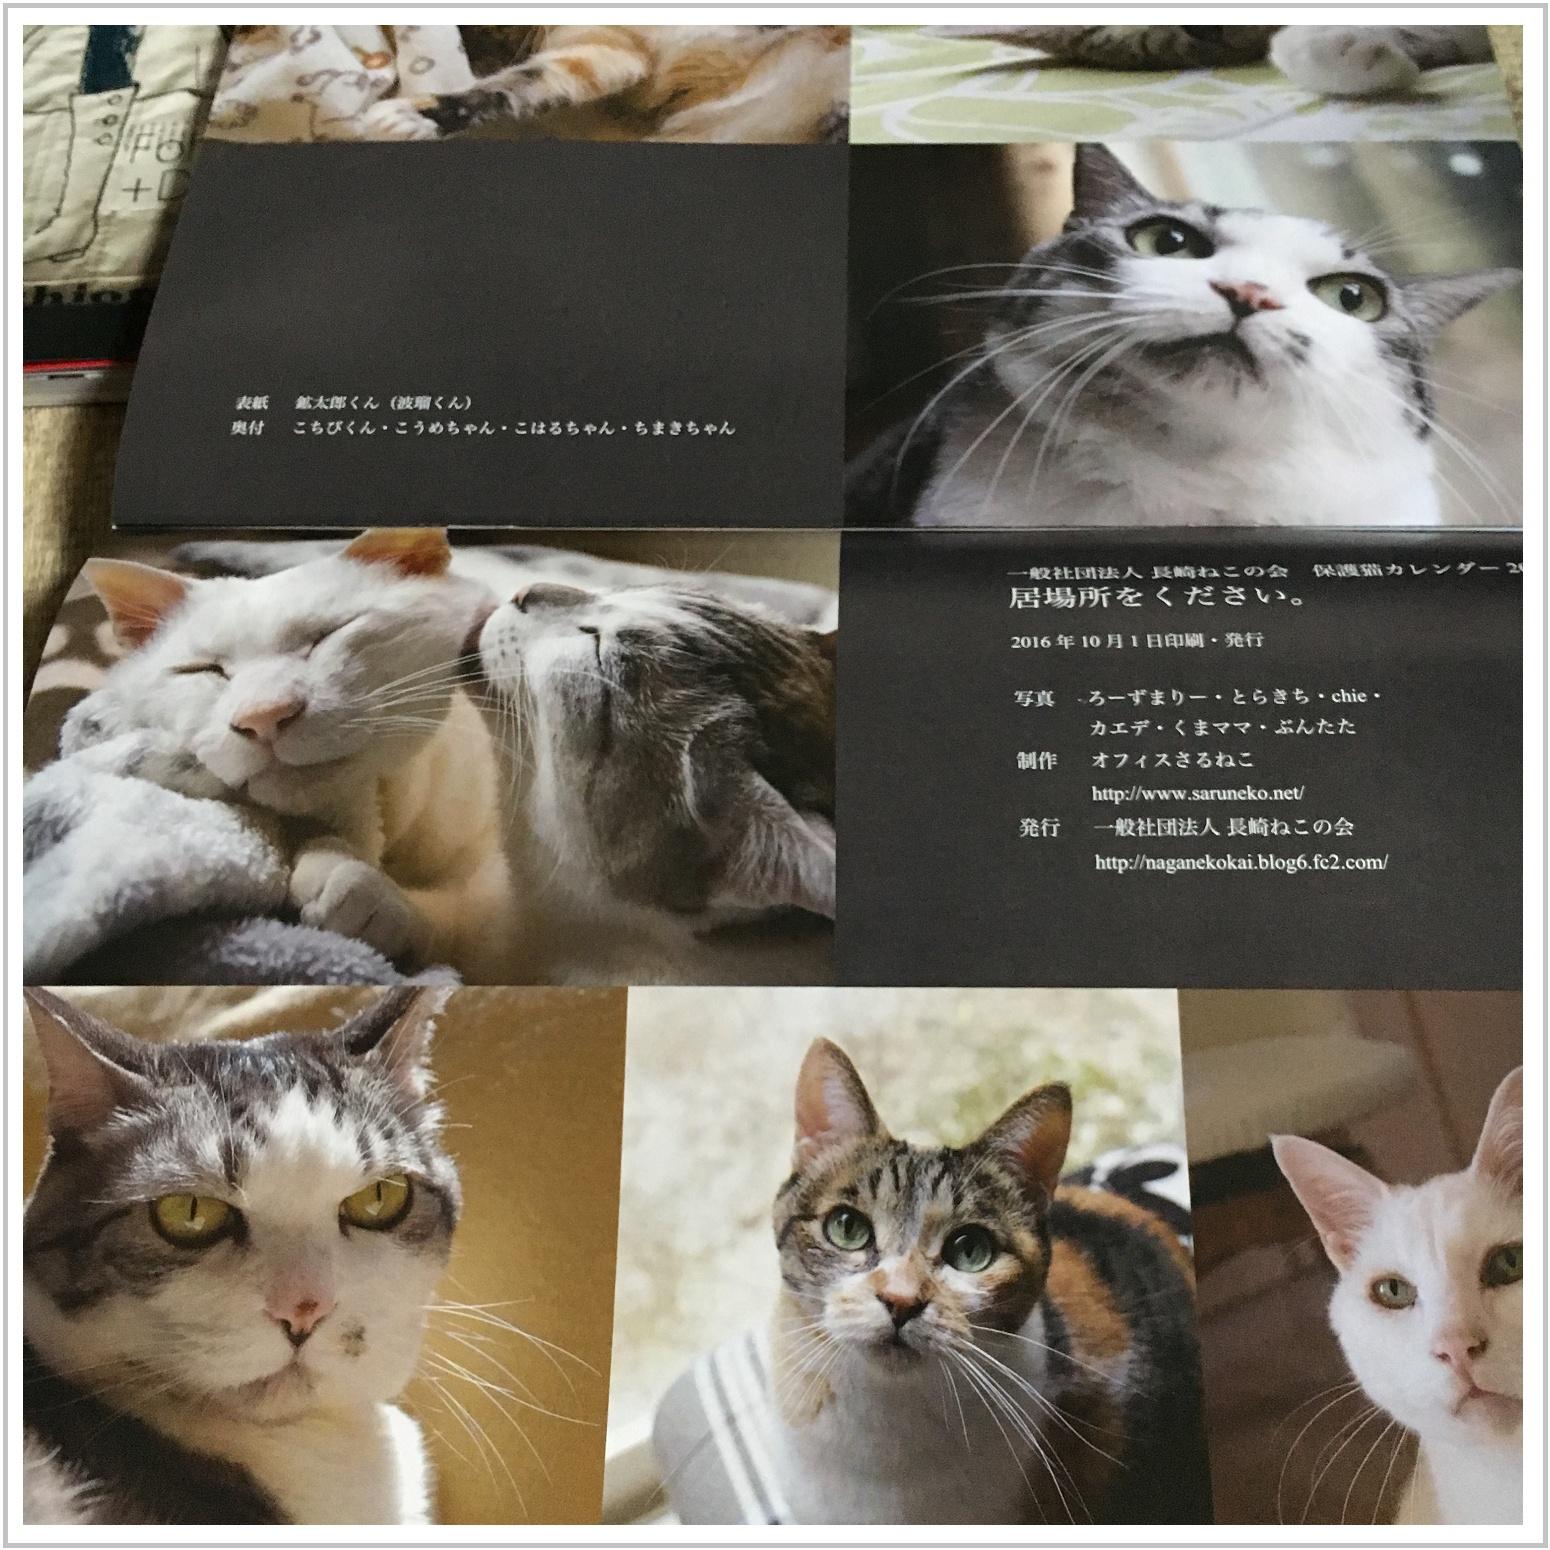 oshare_2_1030.jpg